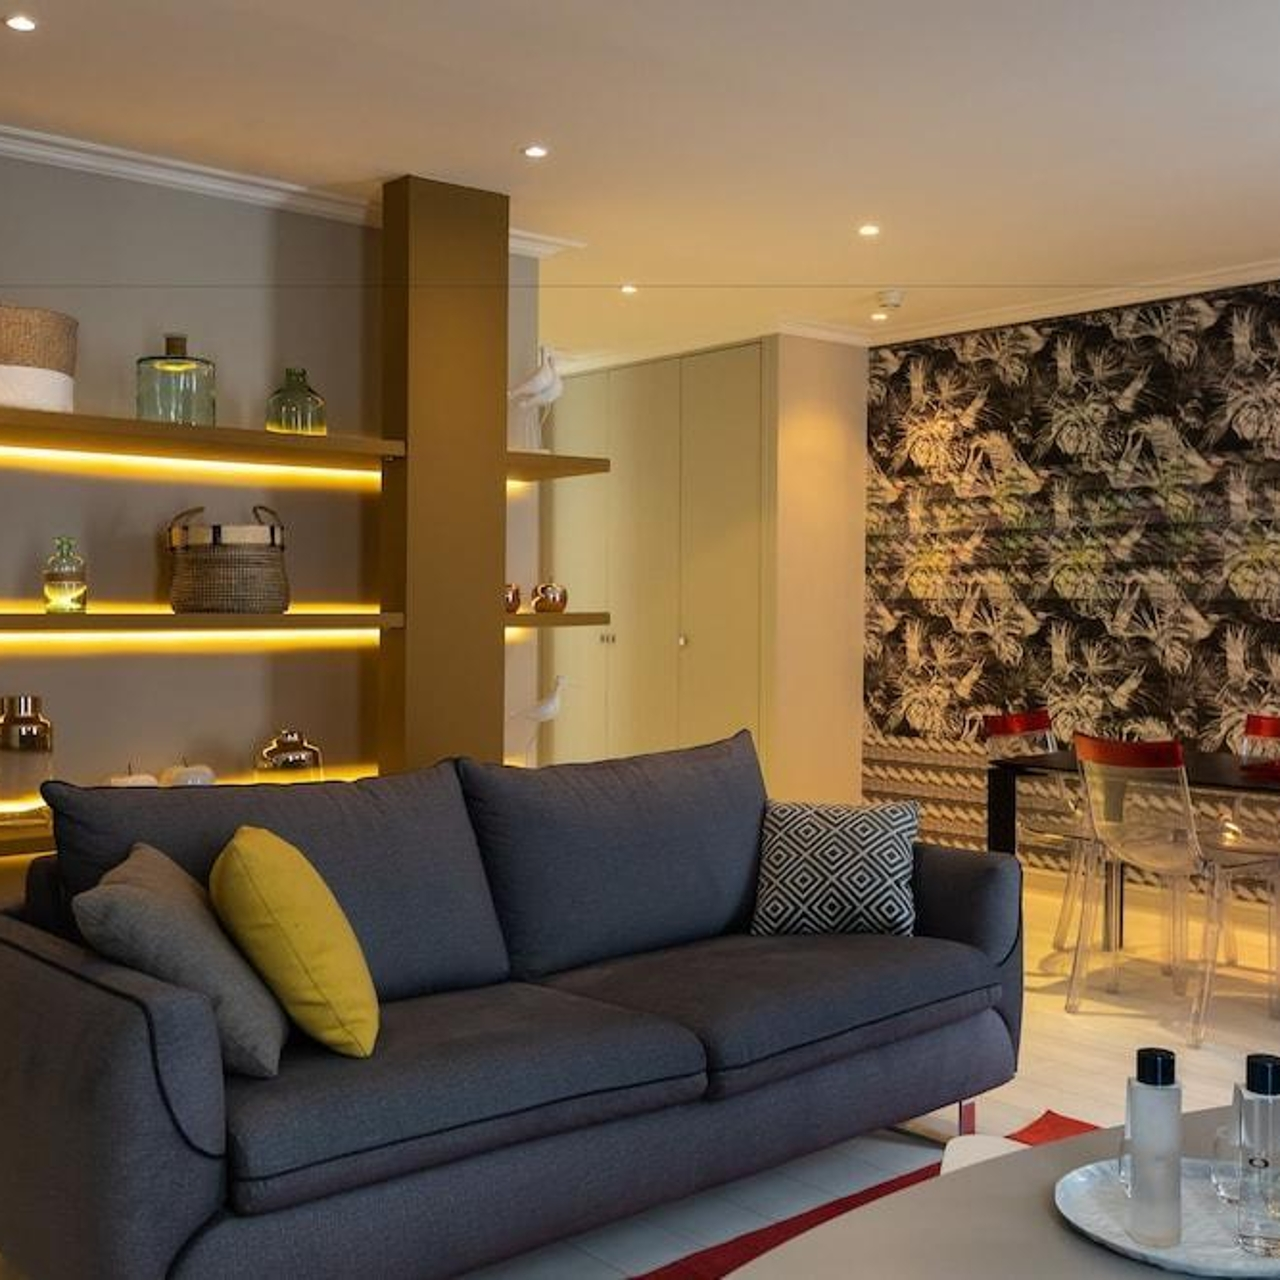 Hotel Residence Spa Le Prince Regent In Paris Ile De France Hrs